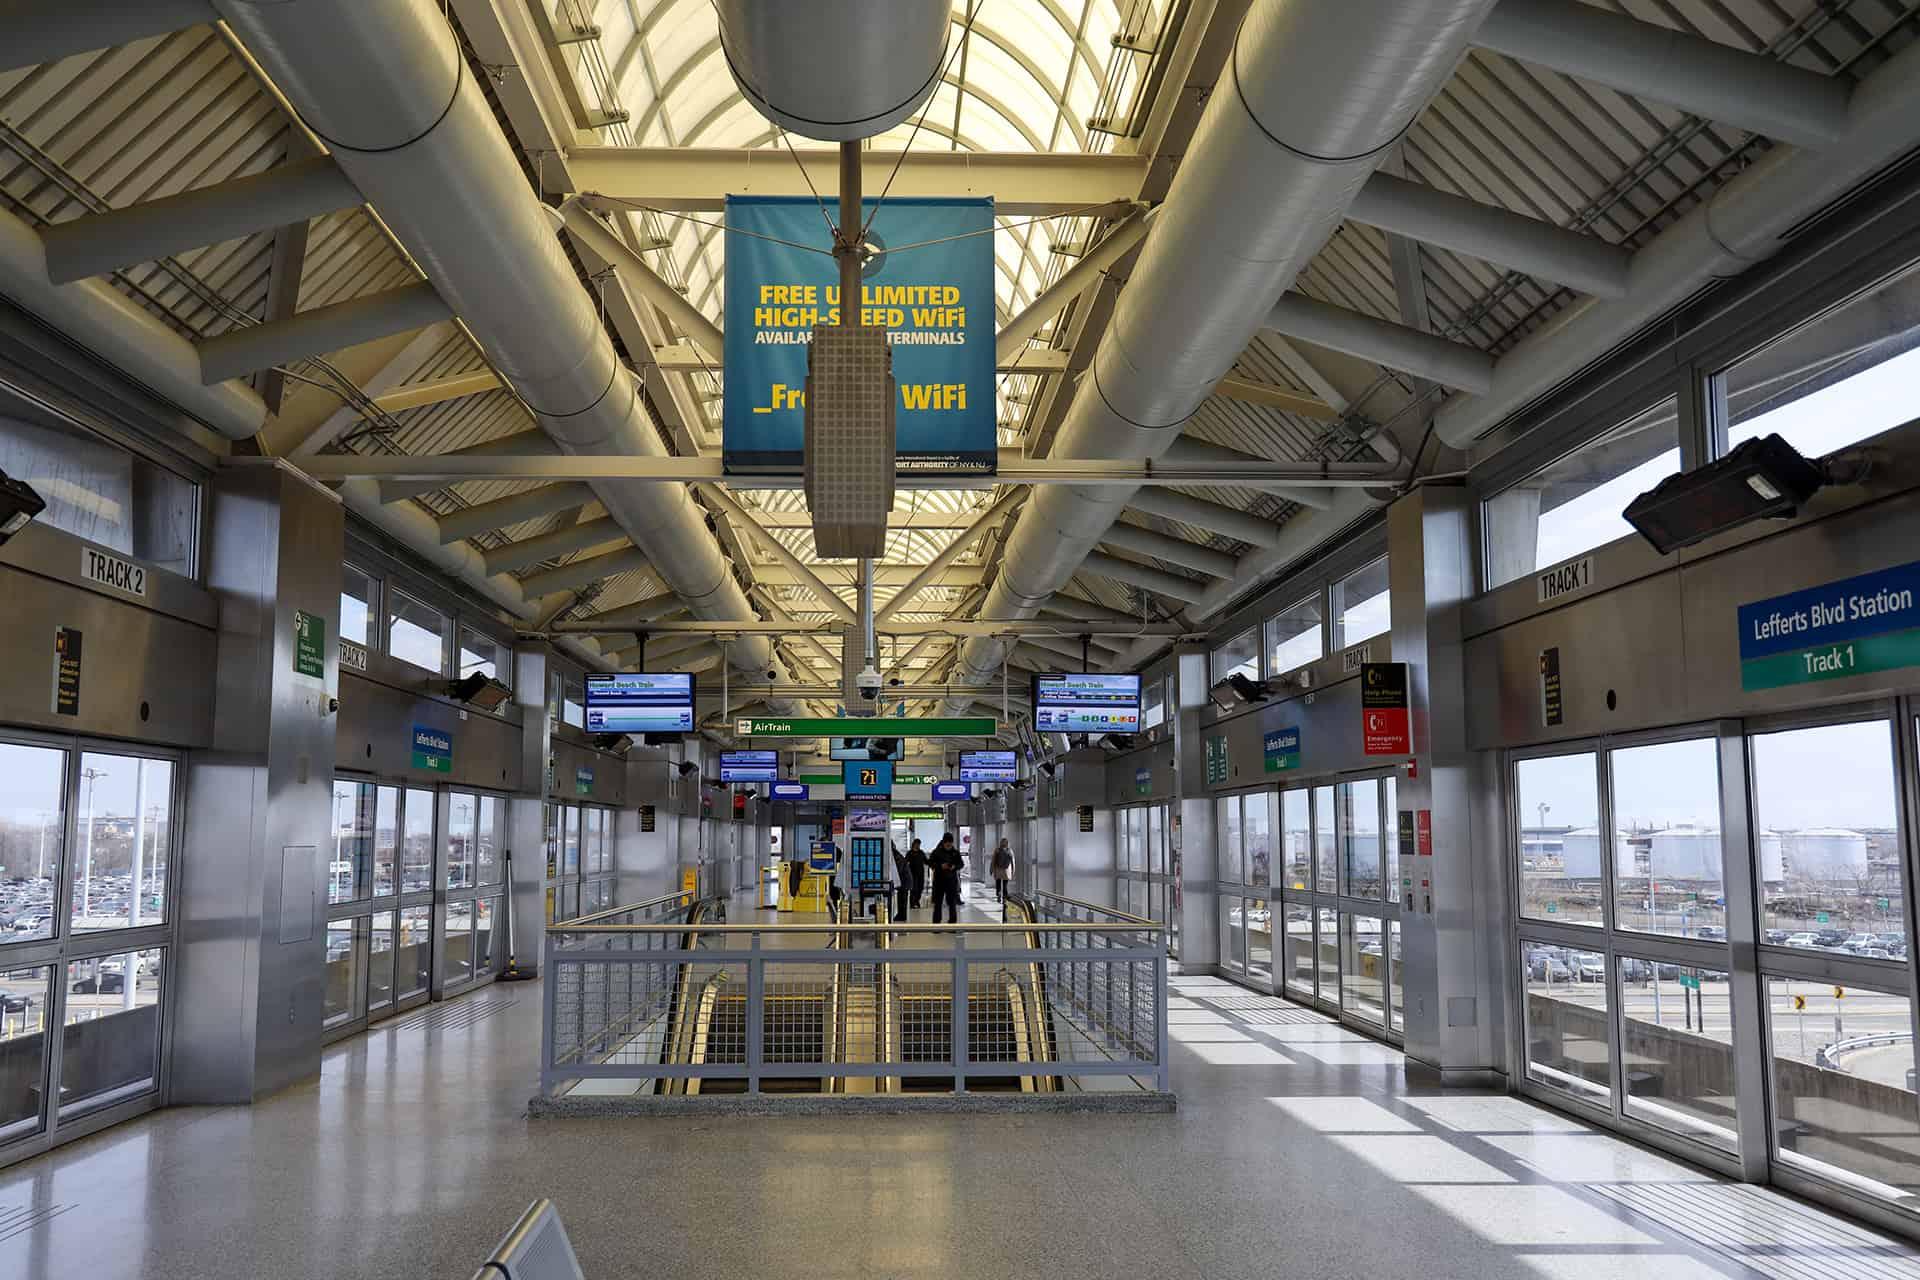 terminal aeroport jfk station